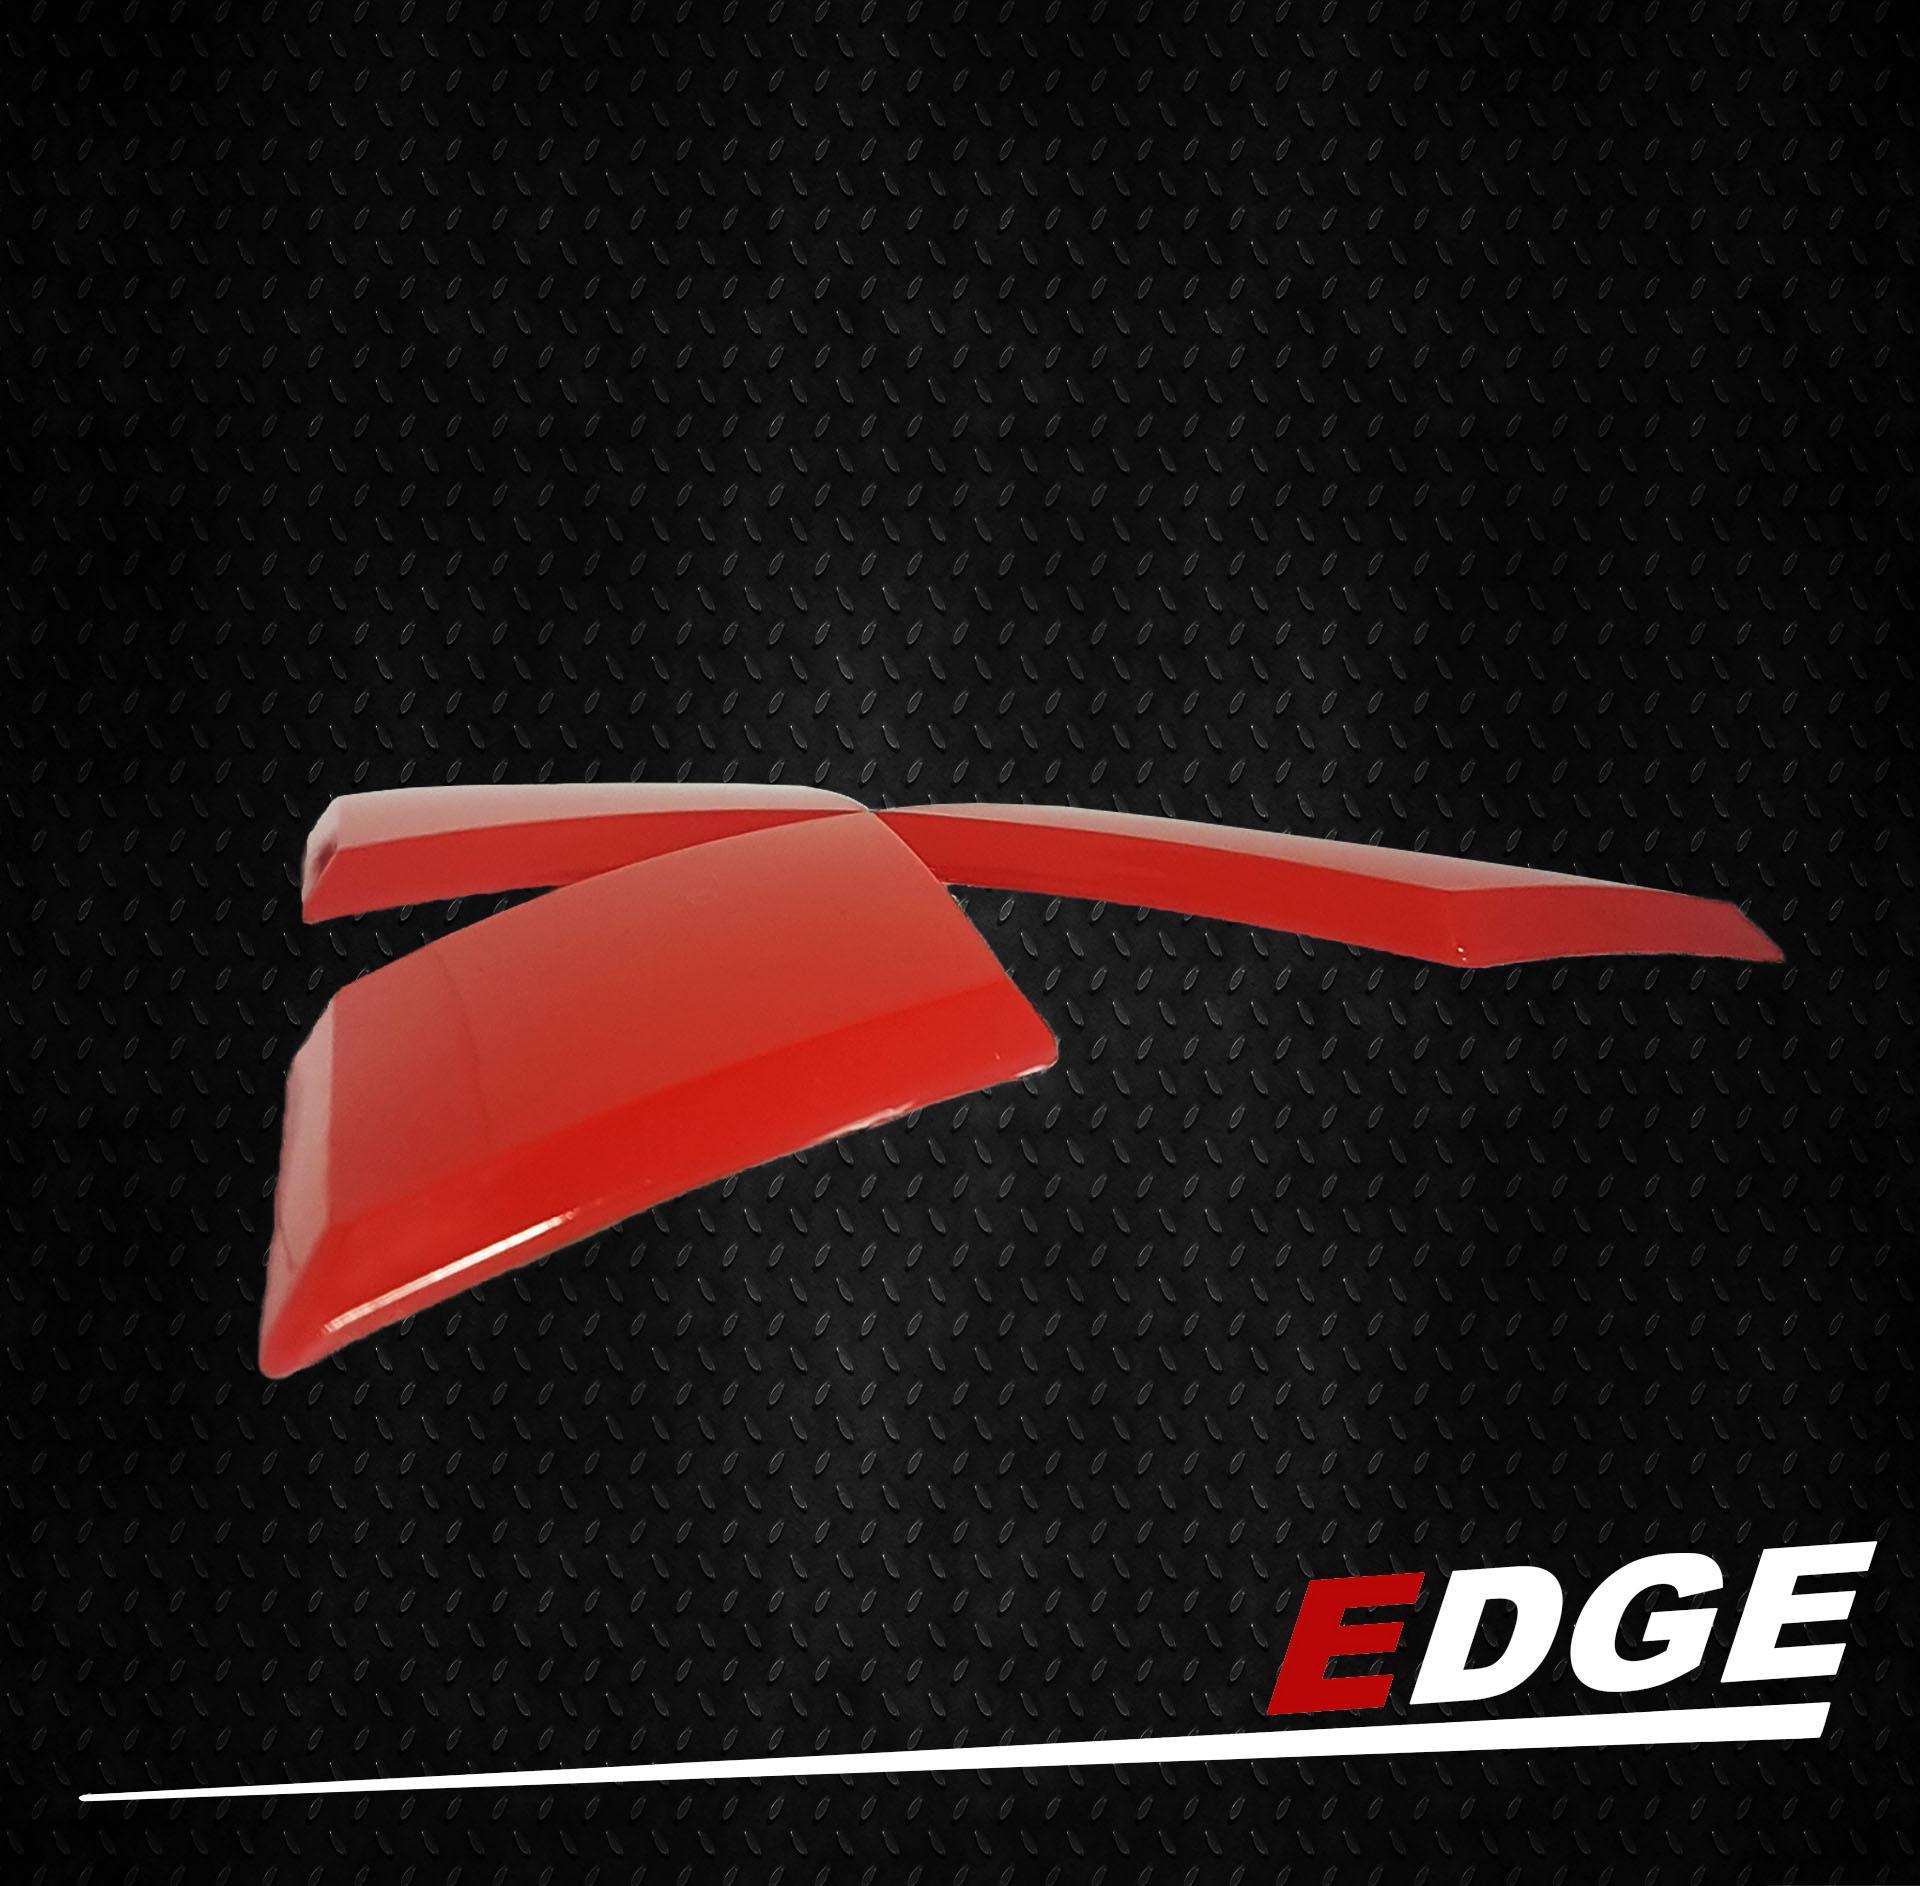 The Price Of Mitsubishi Curved Stick On Emblem Decal Logo Symbol